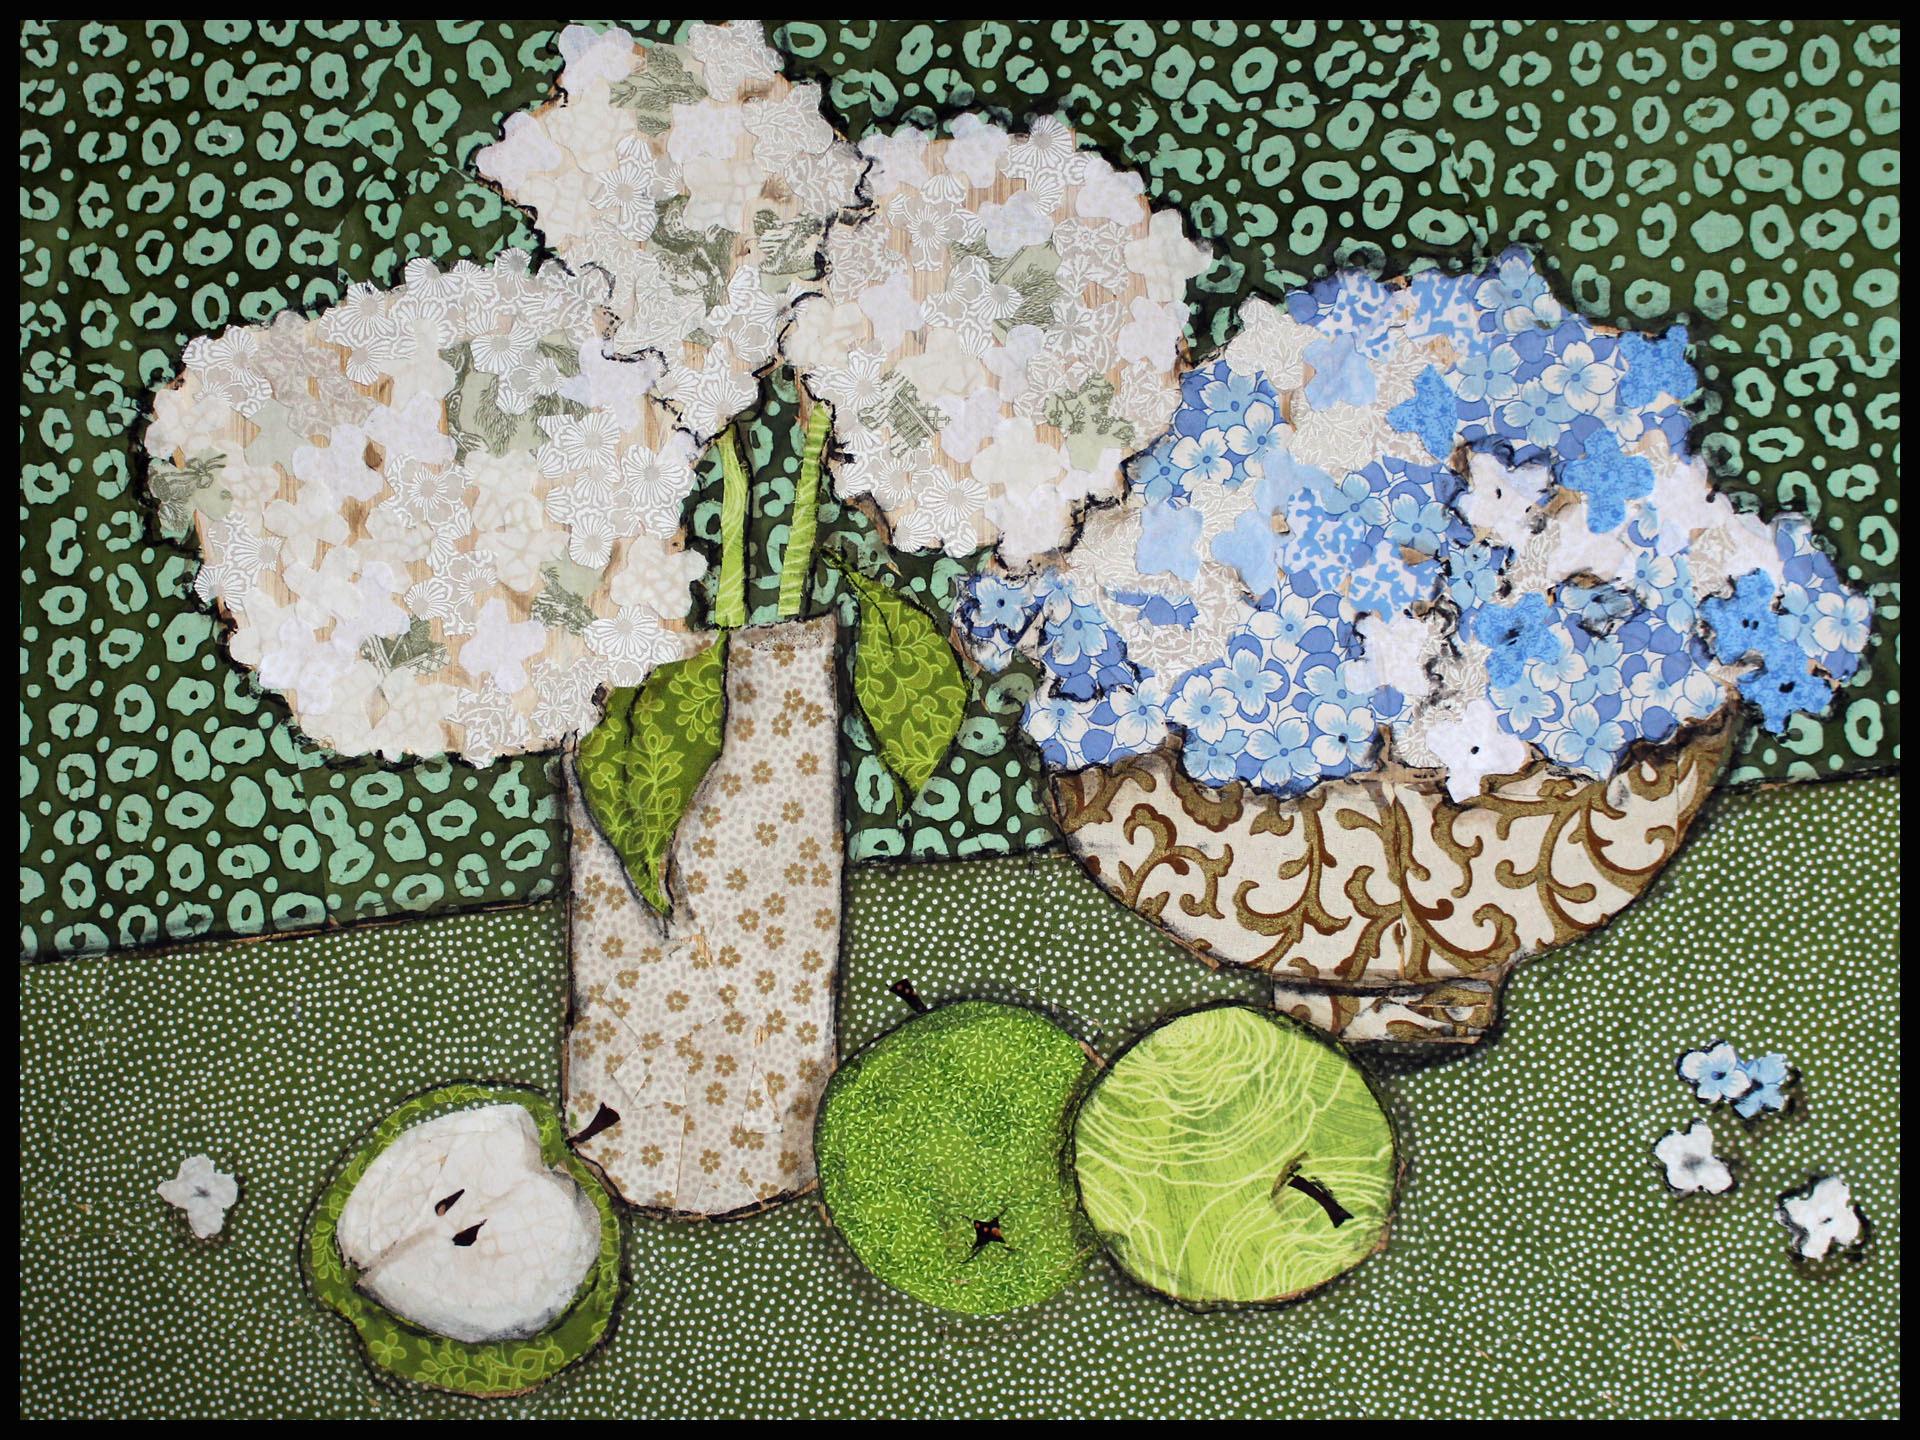 Hydrangea and green apples framed ksfhuu